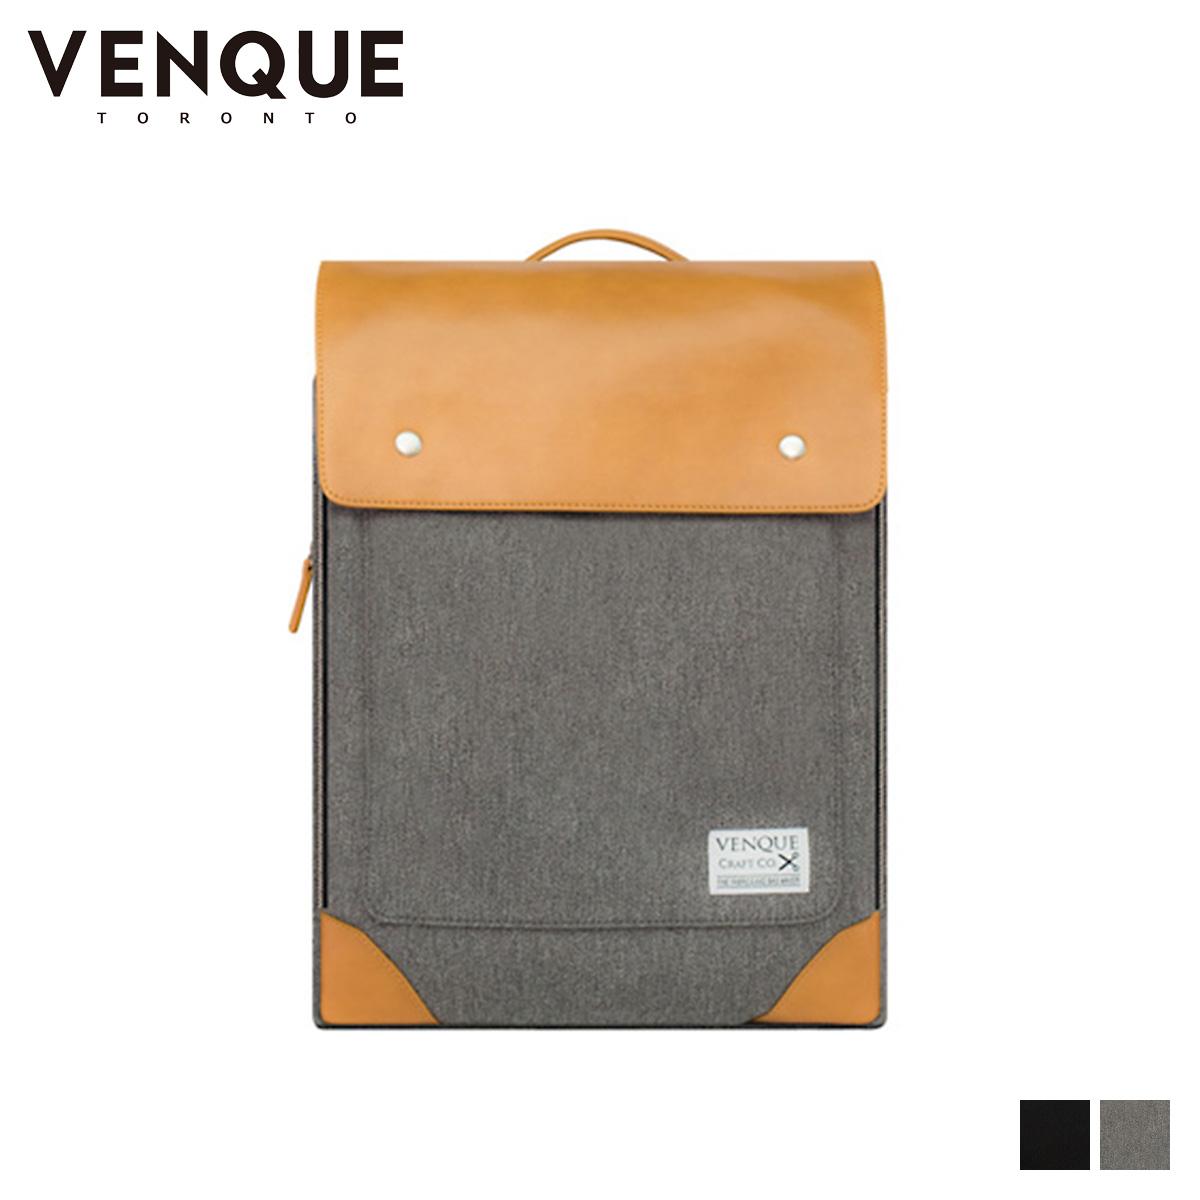 VENQUE ヴェンク リュック バッグ バックパック メンズ レディース 24L FLATSQUARE ブラック グレー 黒